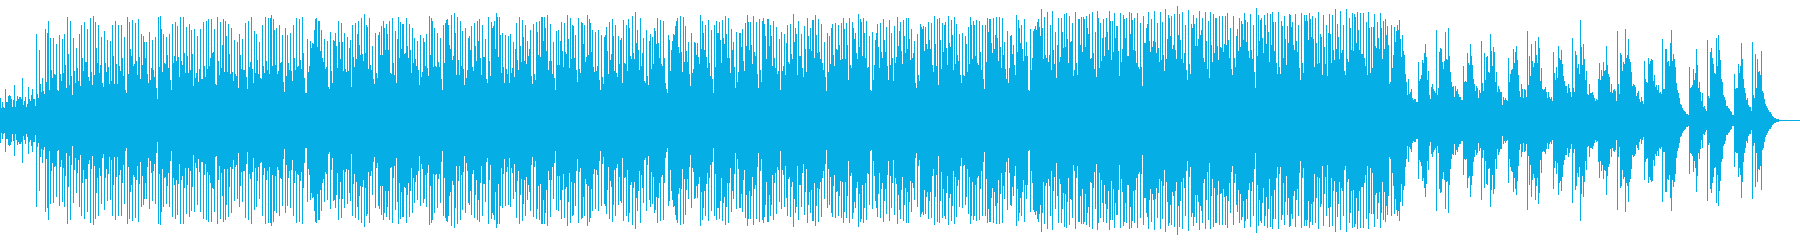 製品・会社紹介 科学天気予報 淡々透明感の再生済みの波形